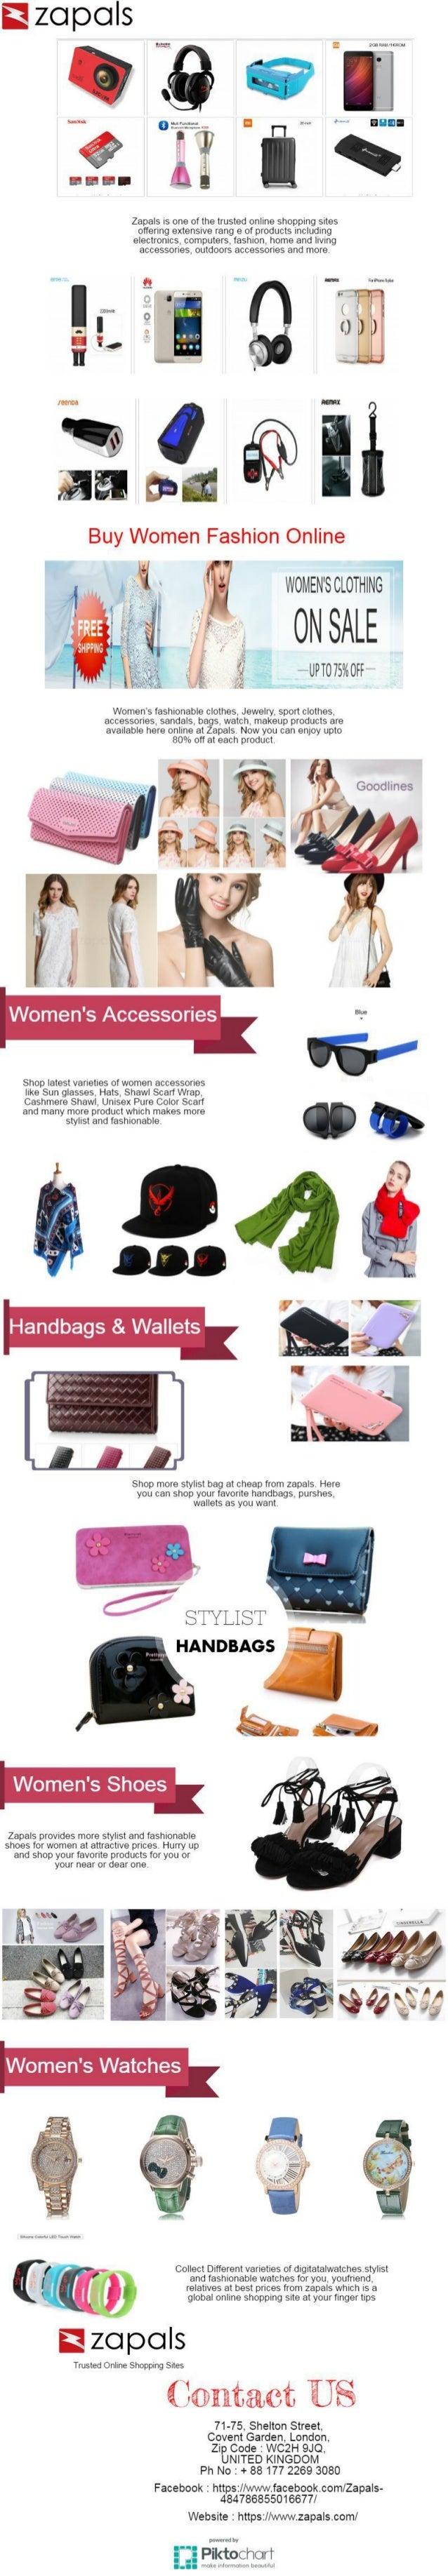 Buy Latest Women Fashion Online